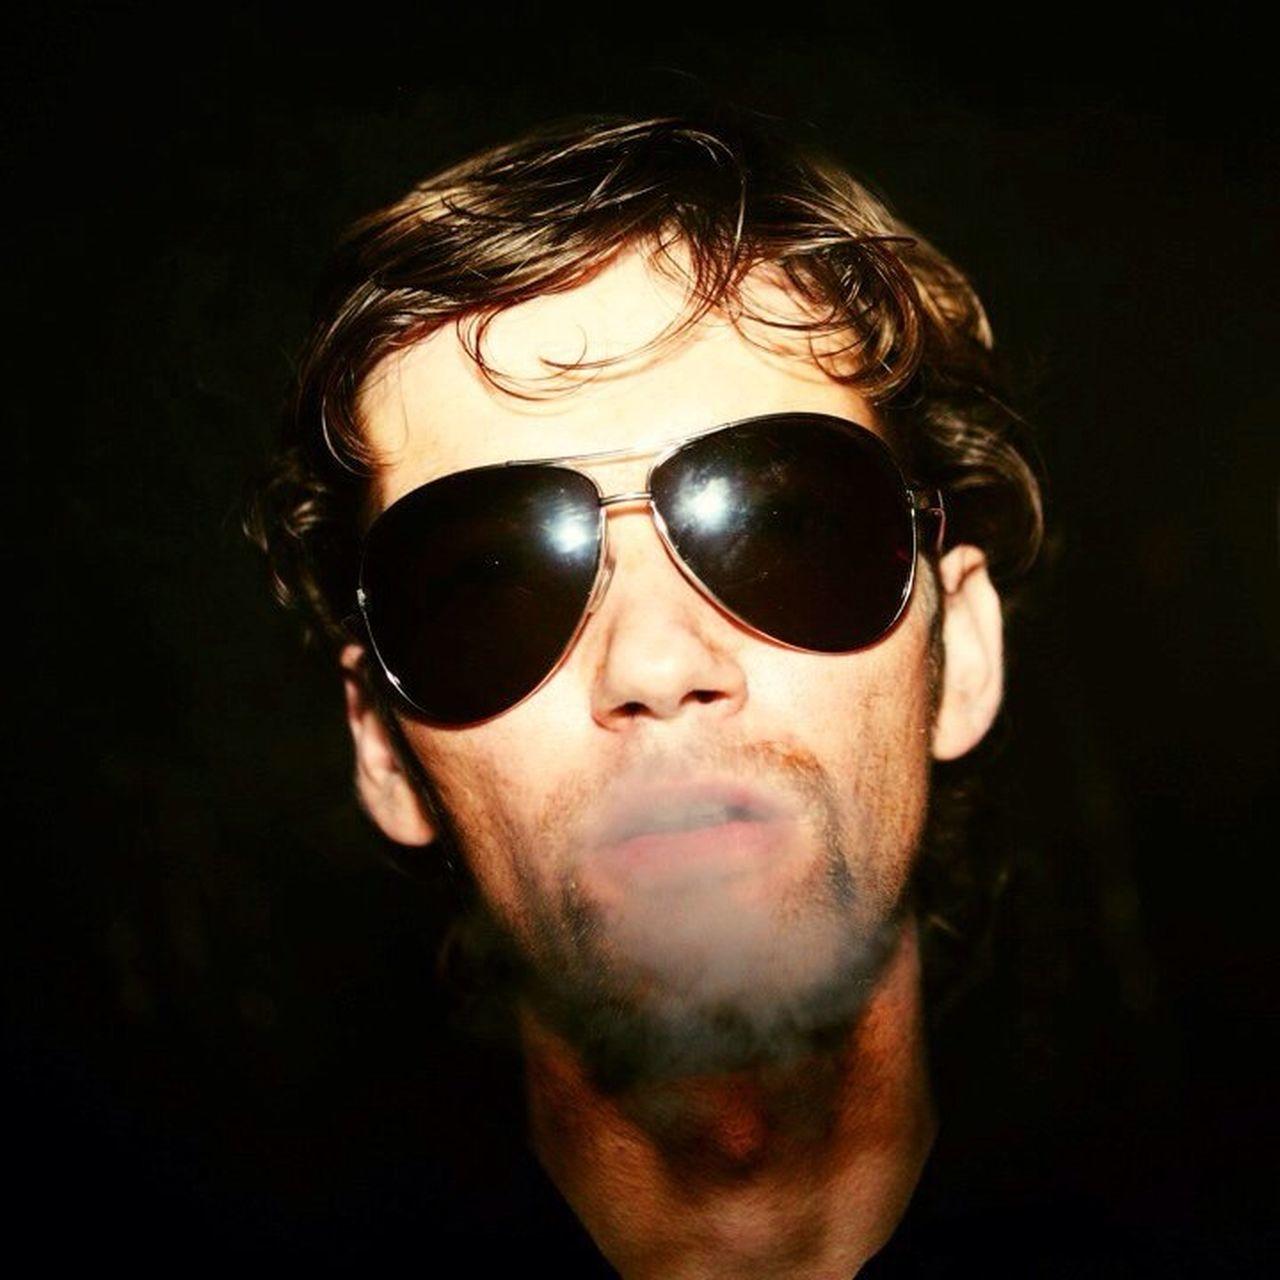 Manuel Gotzen Self Portrait © krischerfotografie